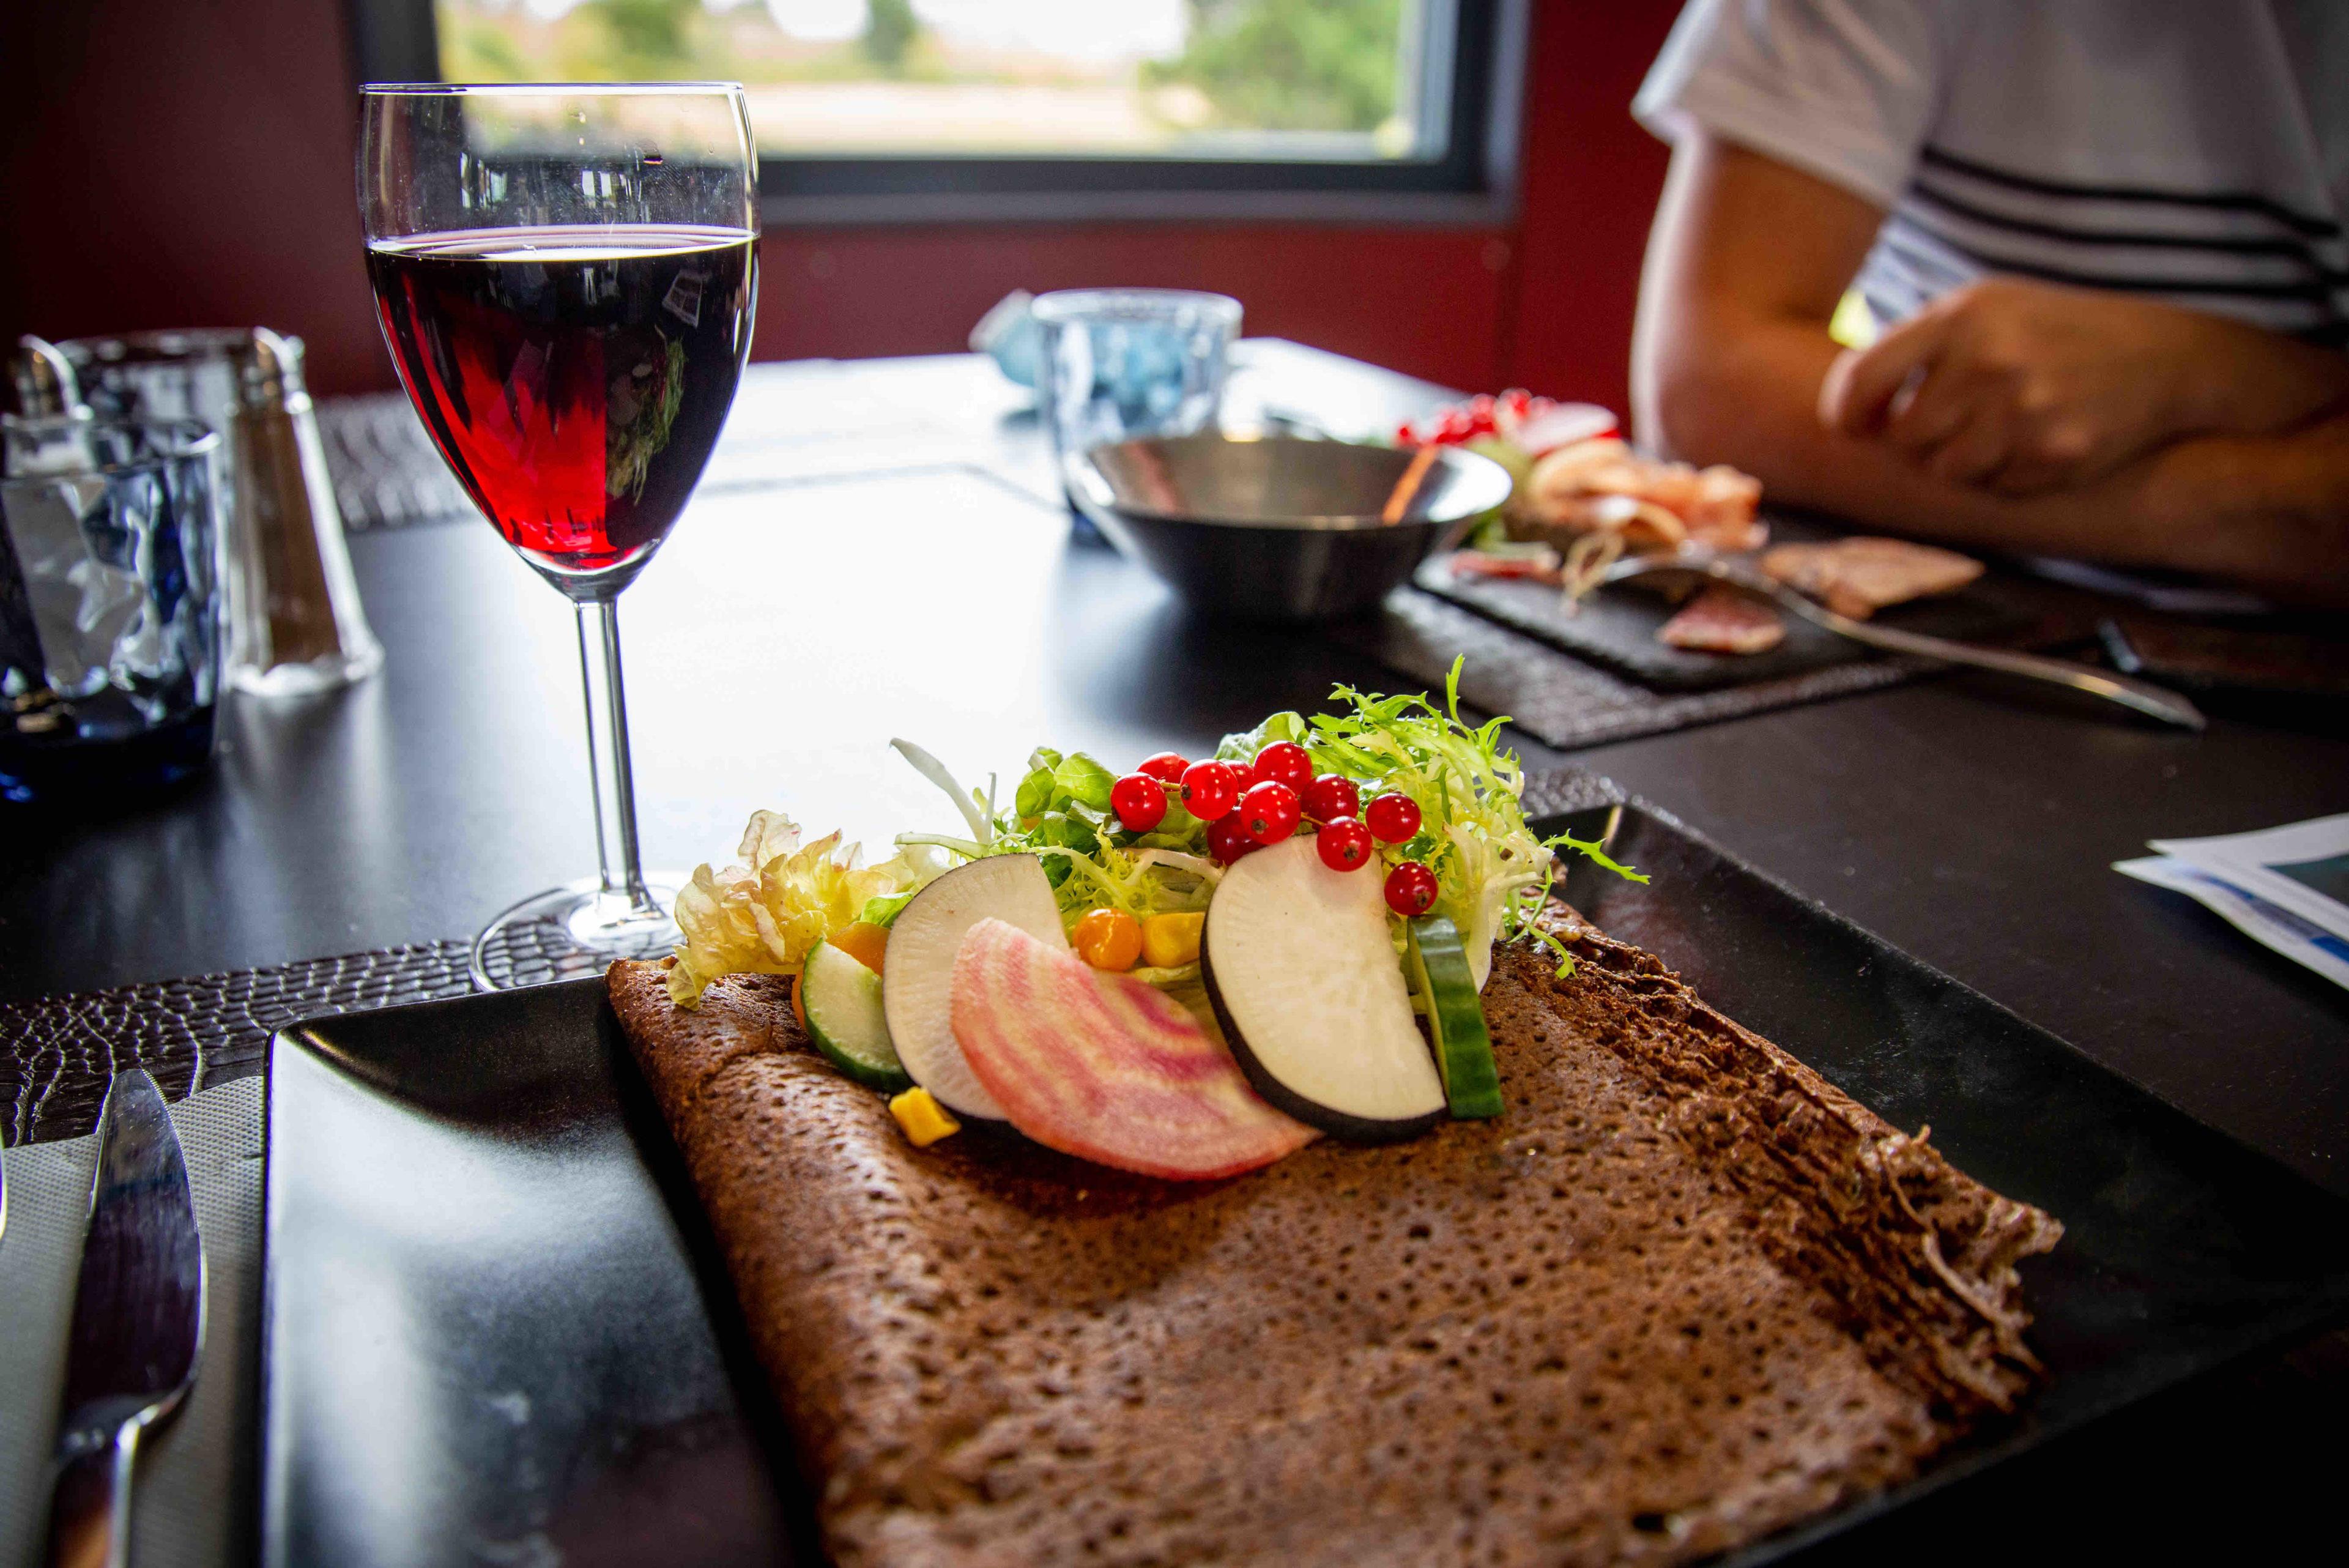 creperie-la-saline-galette-cherbourg-cotentin-restaurant-equeurdreville@Christophe-Roisnel